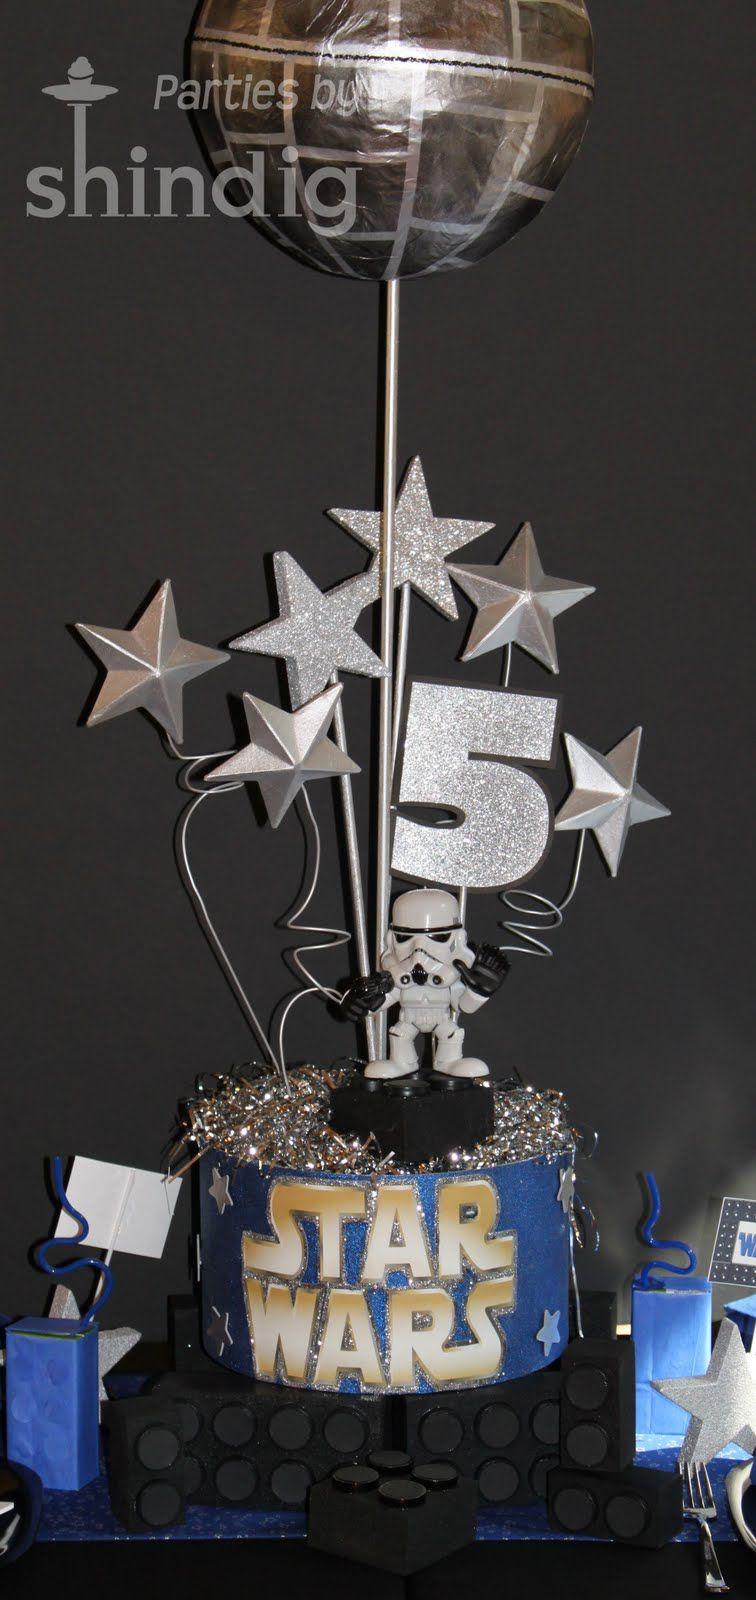 star wars table decorations star wars party details. Black Bedroom Furniture Sets. Home Design Ideas